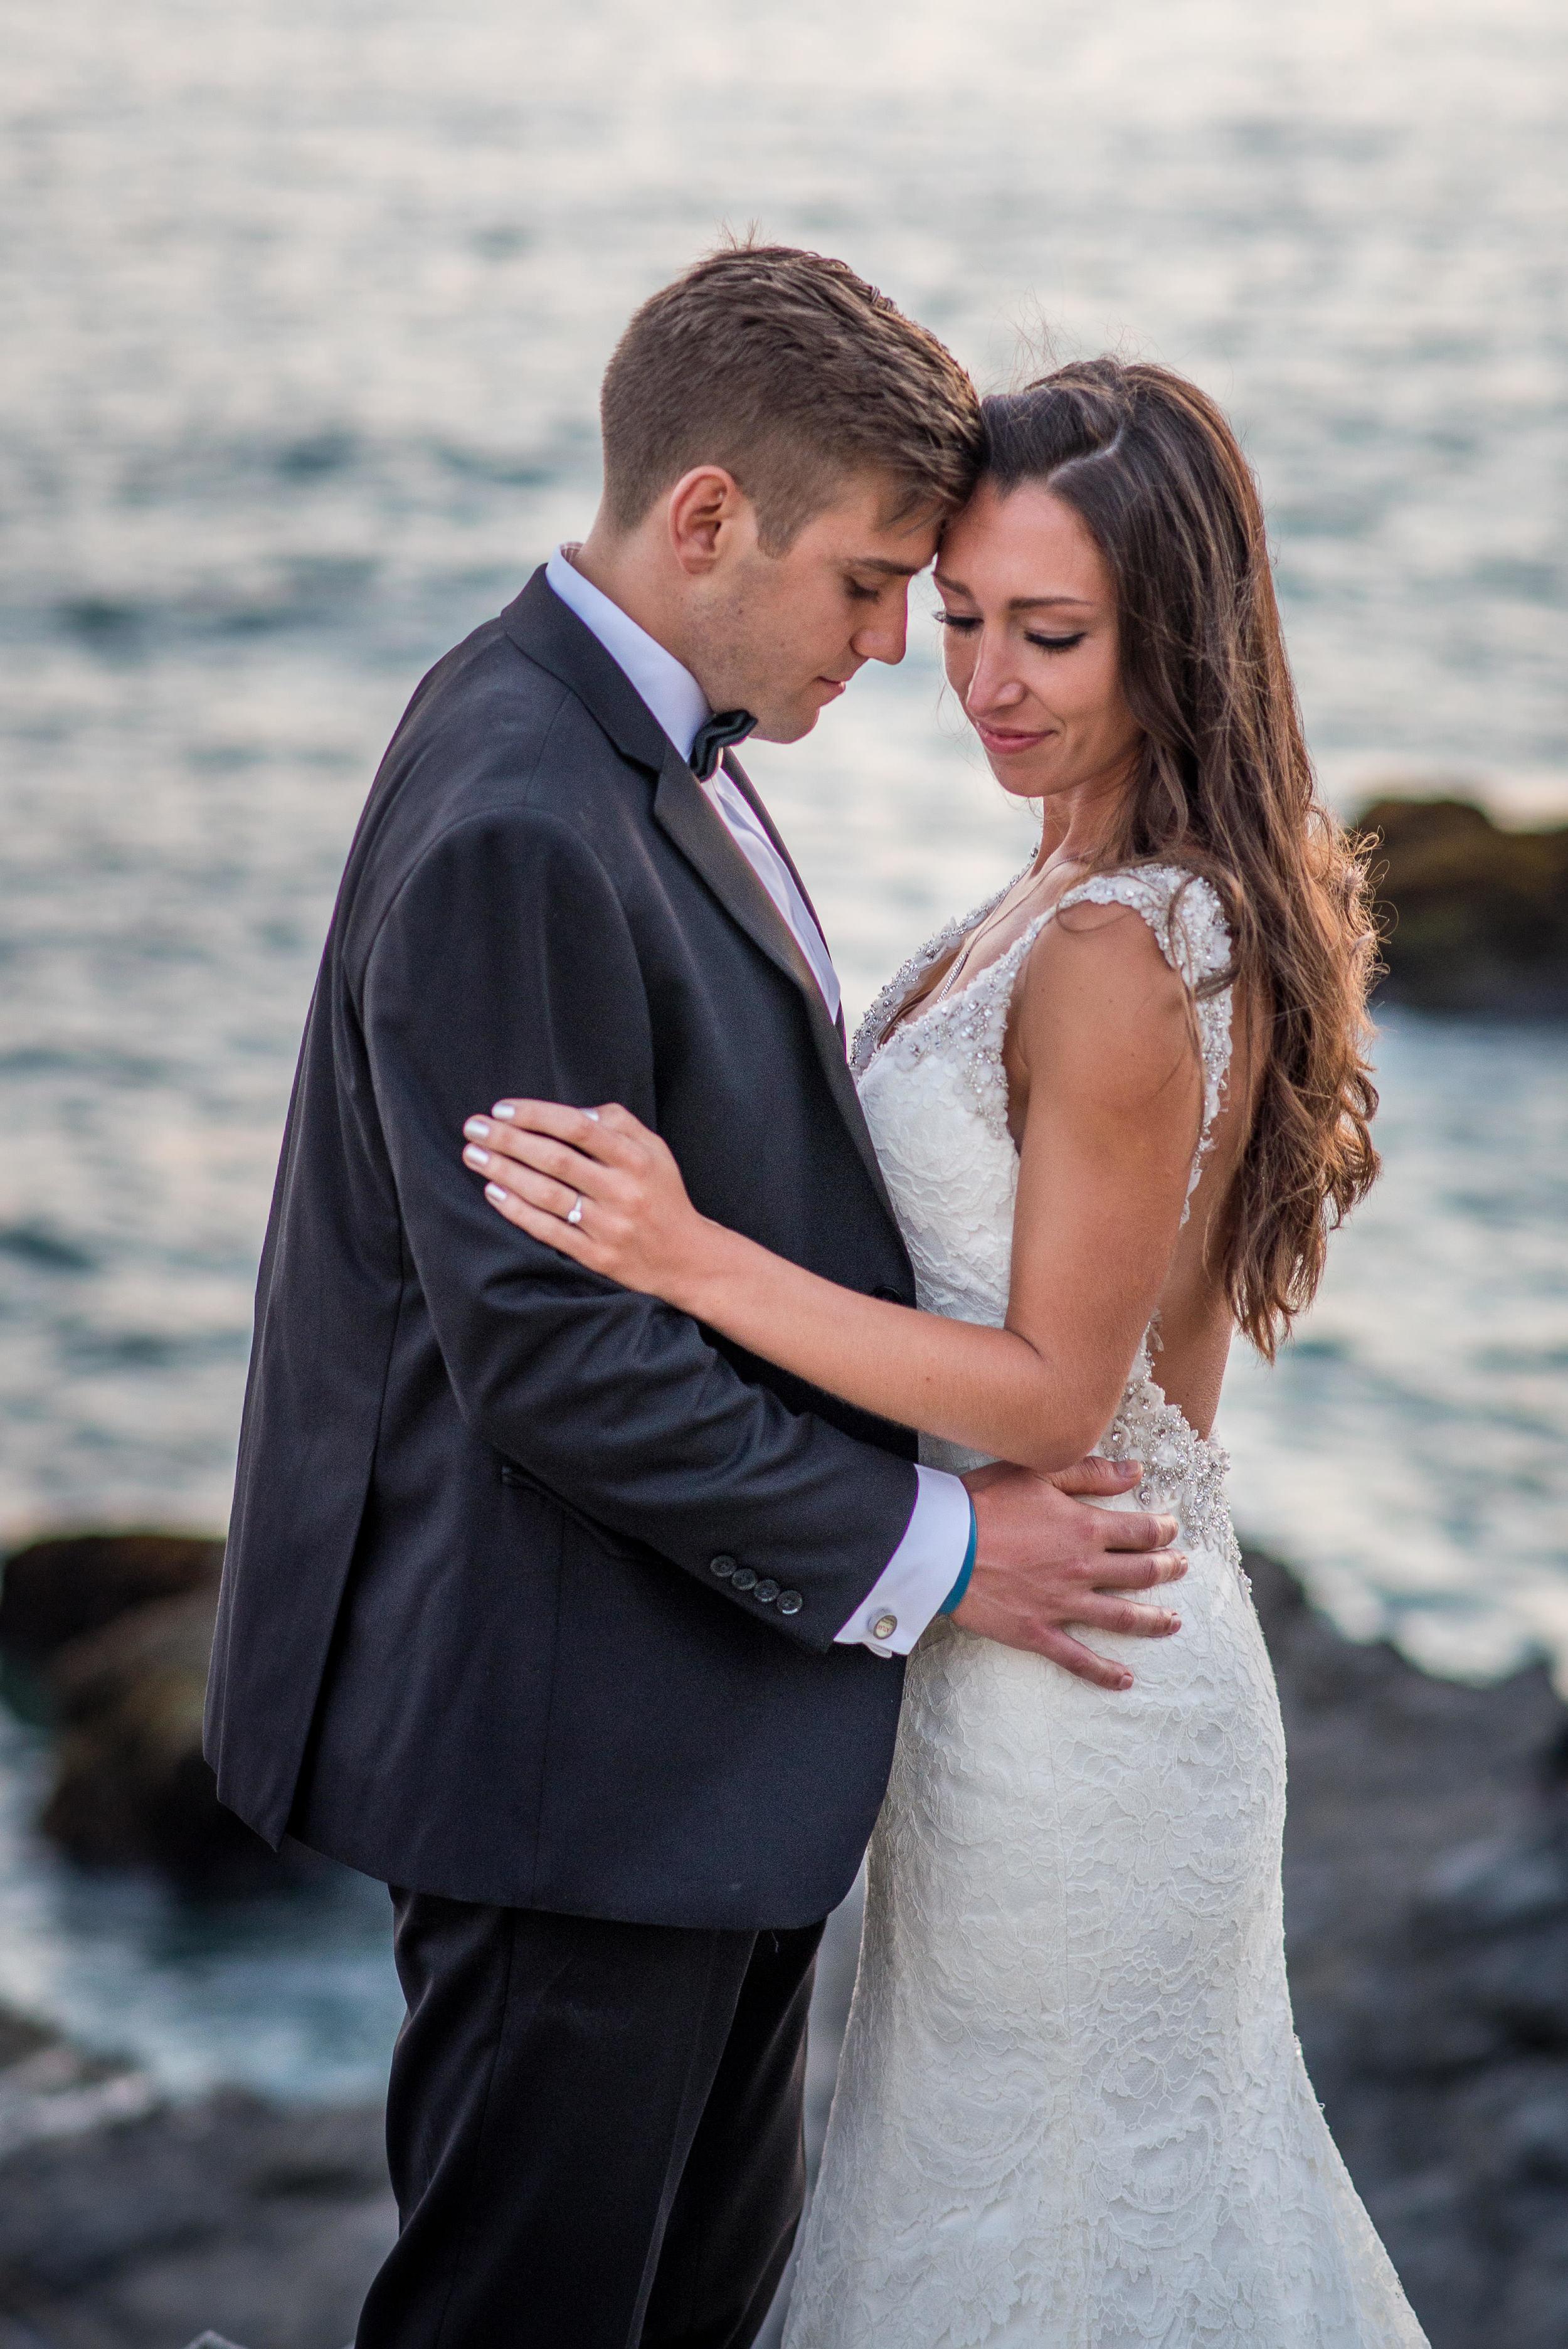 Our wedding day-49.JPG